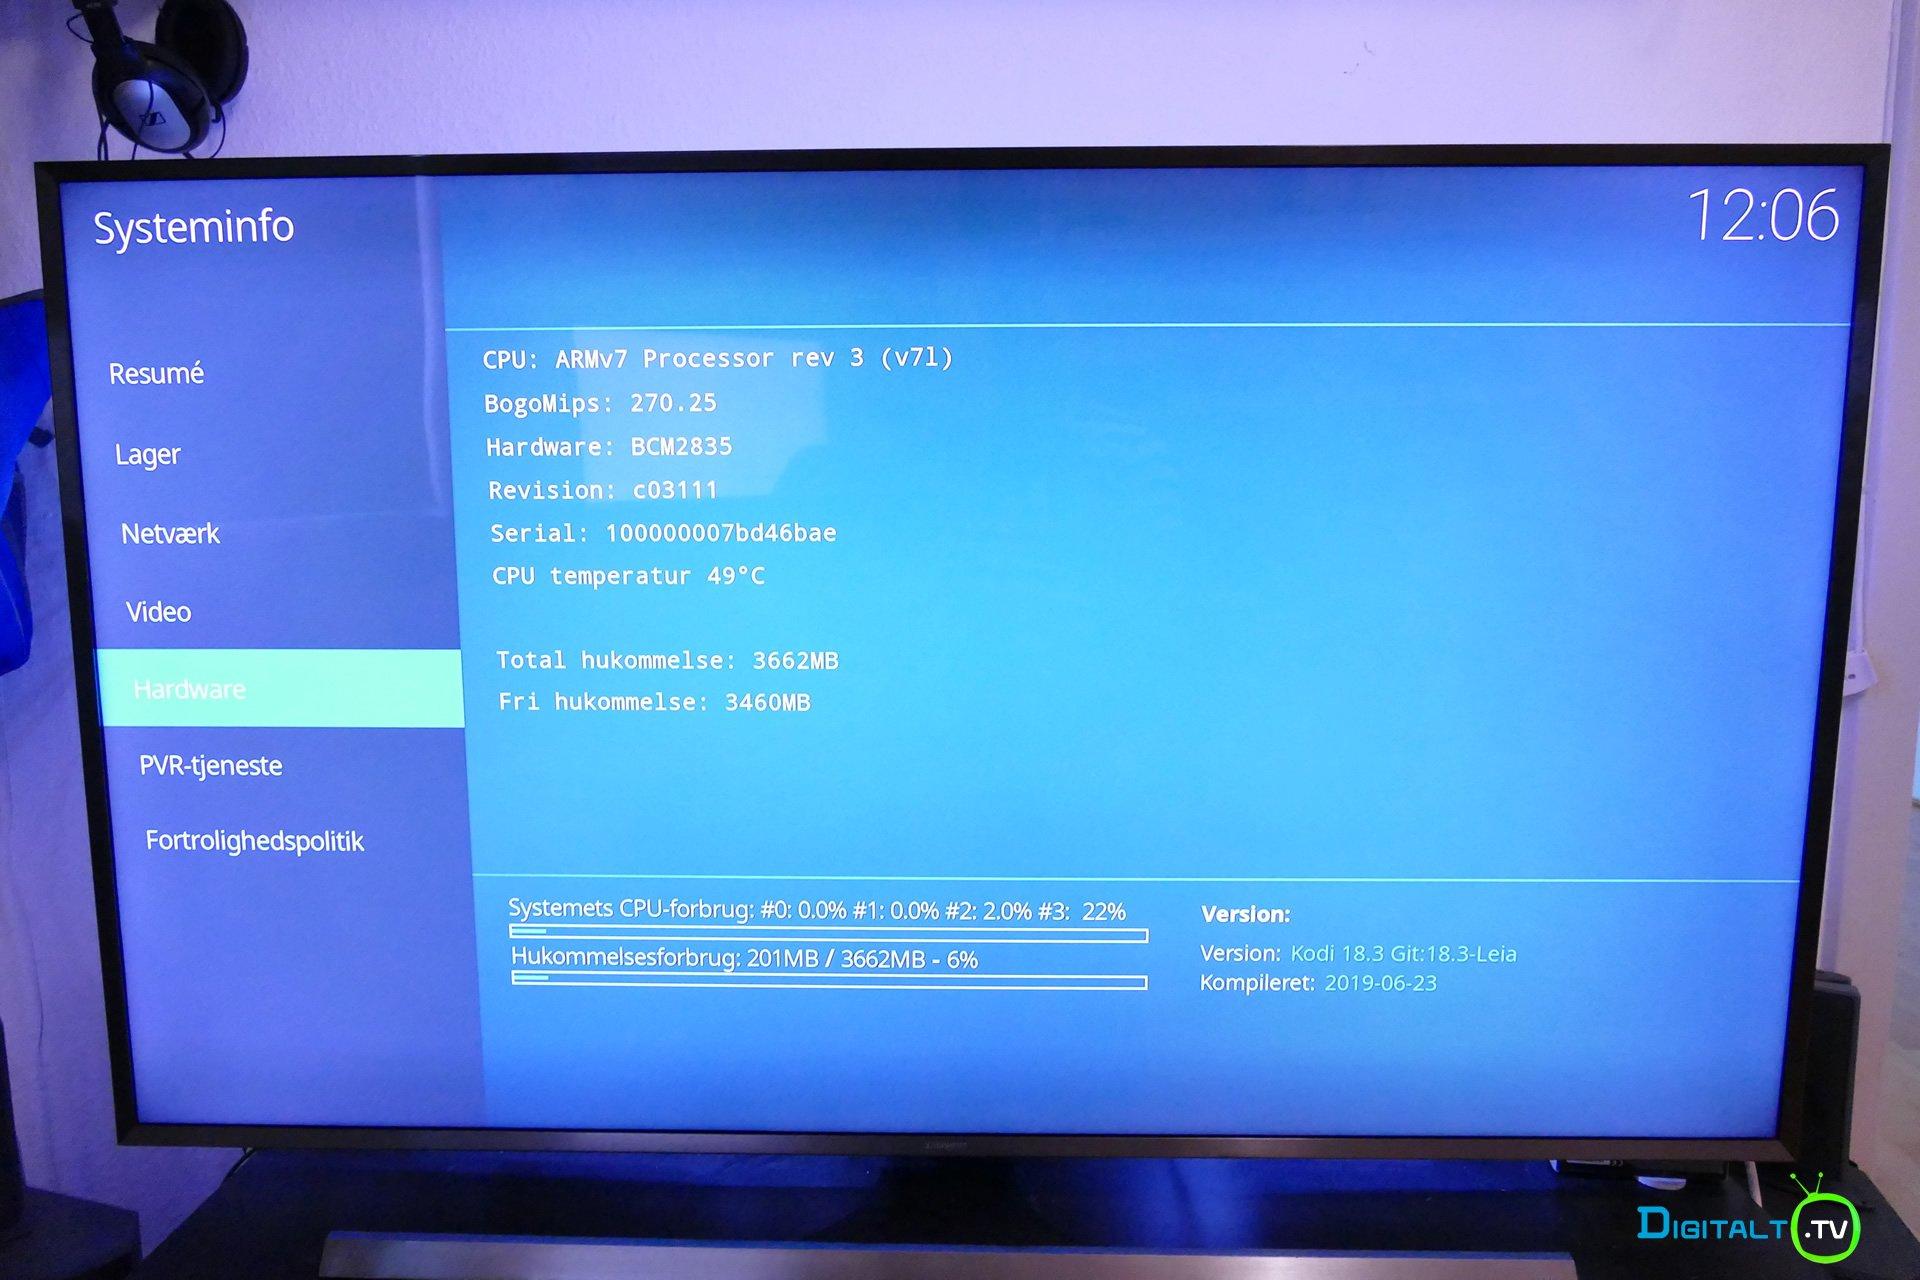 Kodi Raspberry pi 4 systeminfo